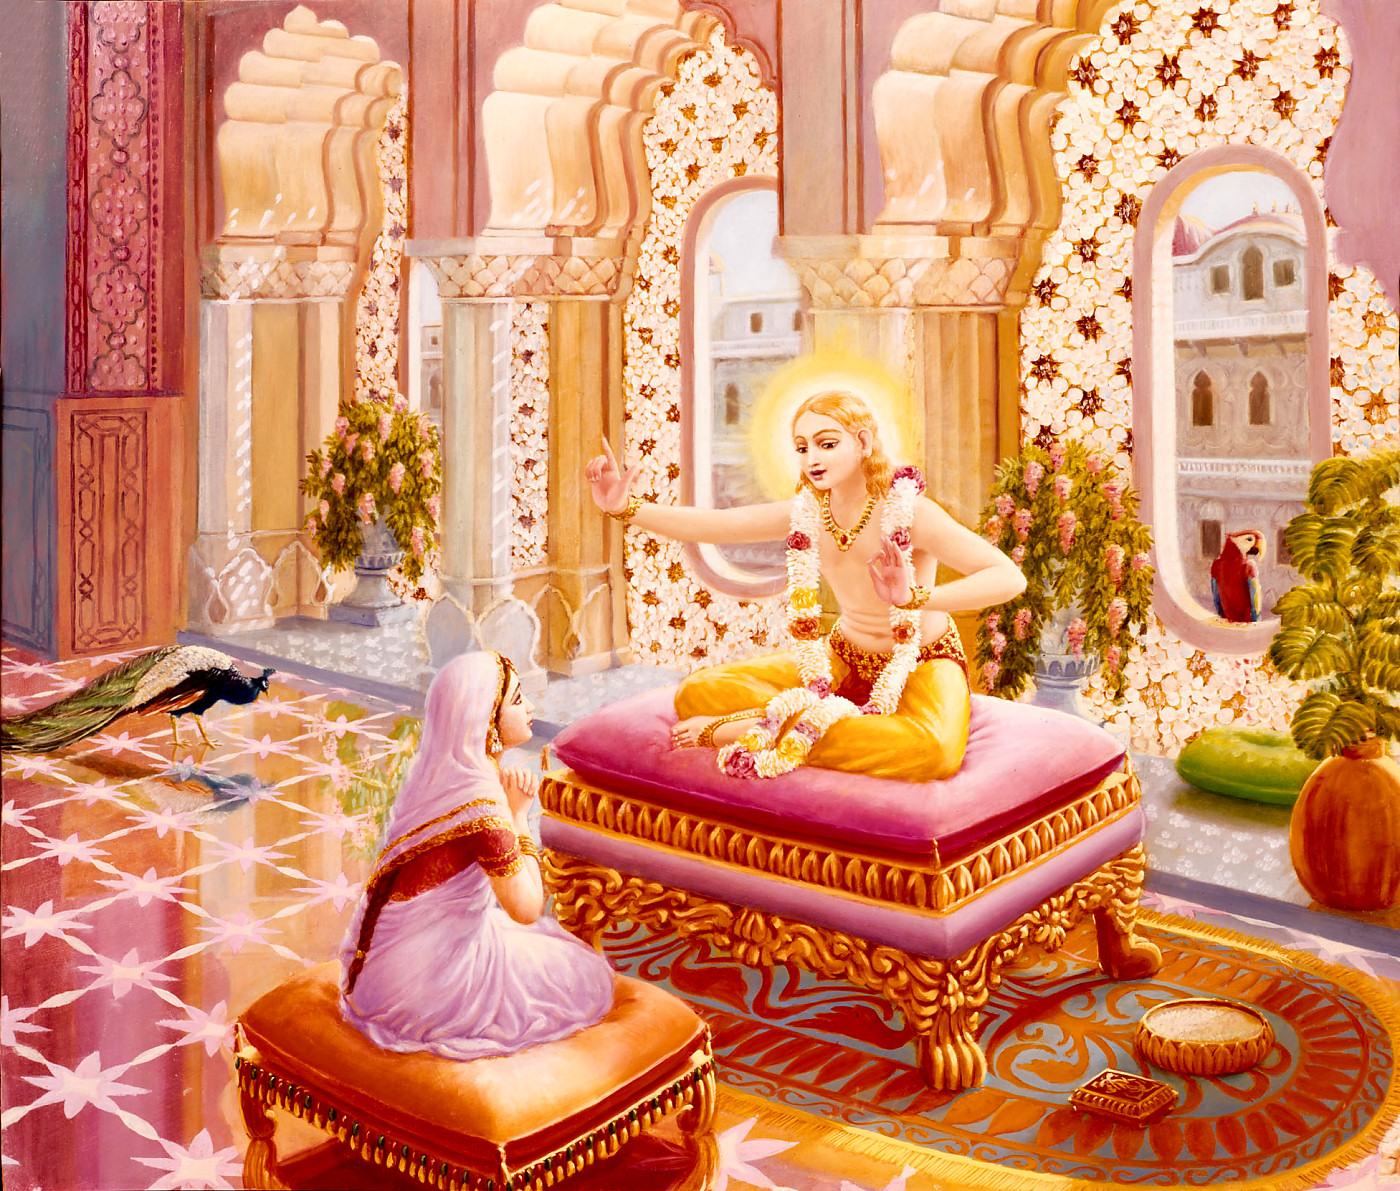 Lord Kapila-Deva instructs Devahuti